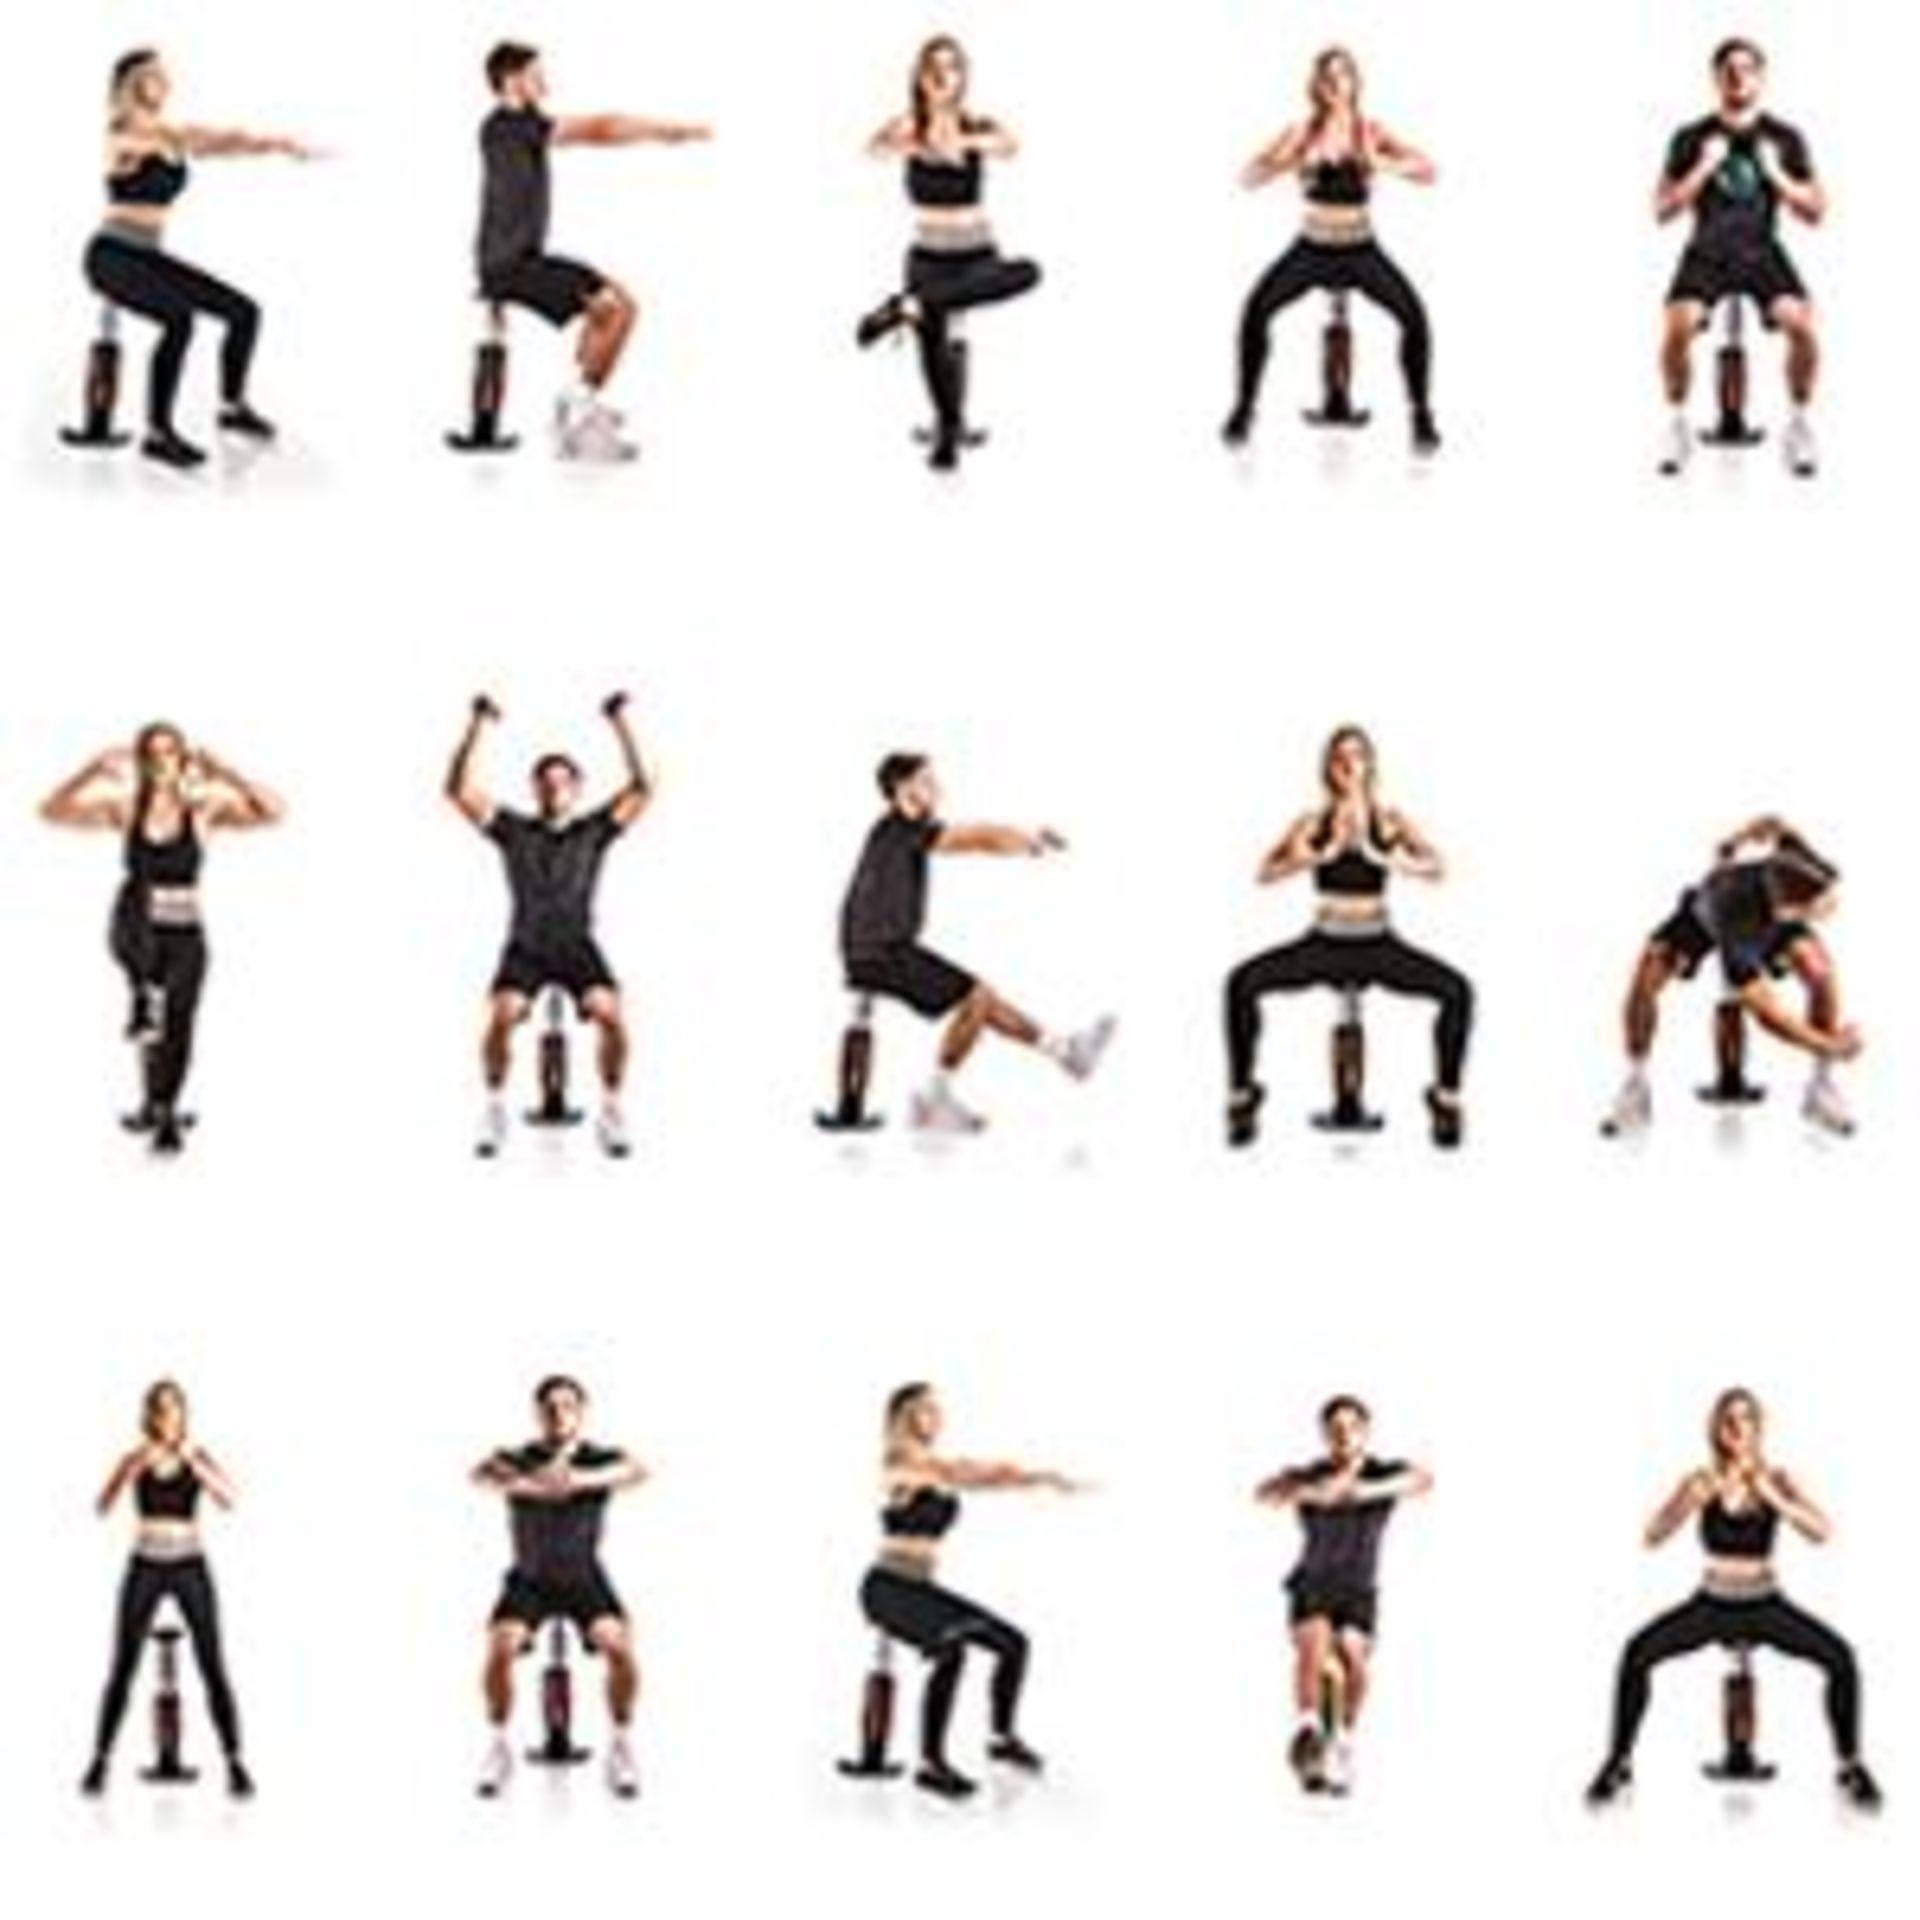 Brand New - New Image Squat Magic Exerciser Rrp 69.99 - Image 2 of 4